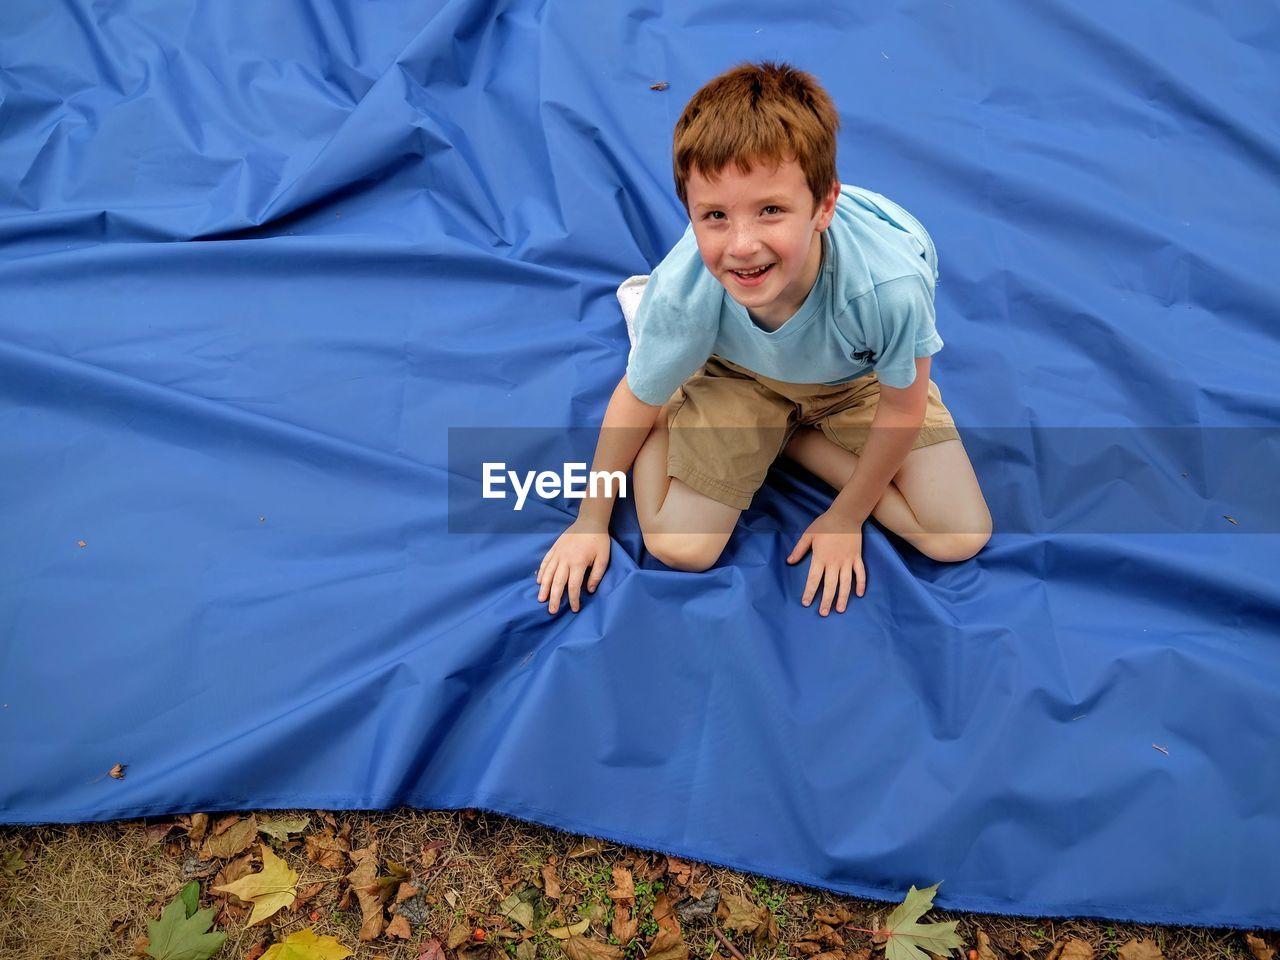 Portrait Of Boy Sitting On Blue Sheet